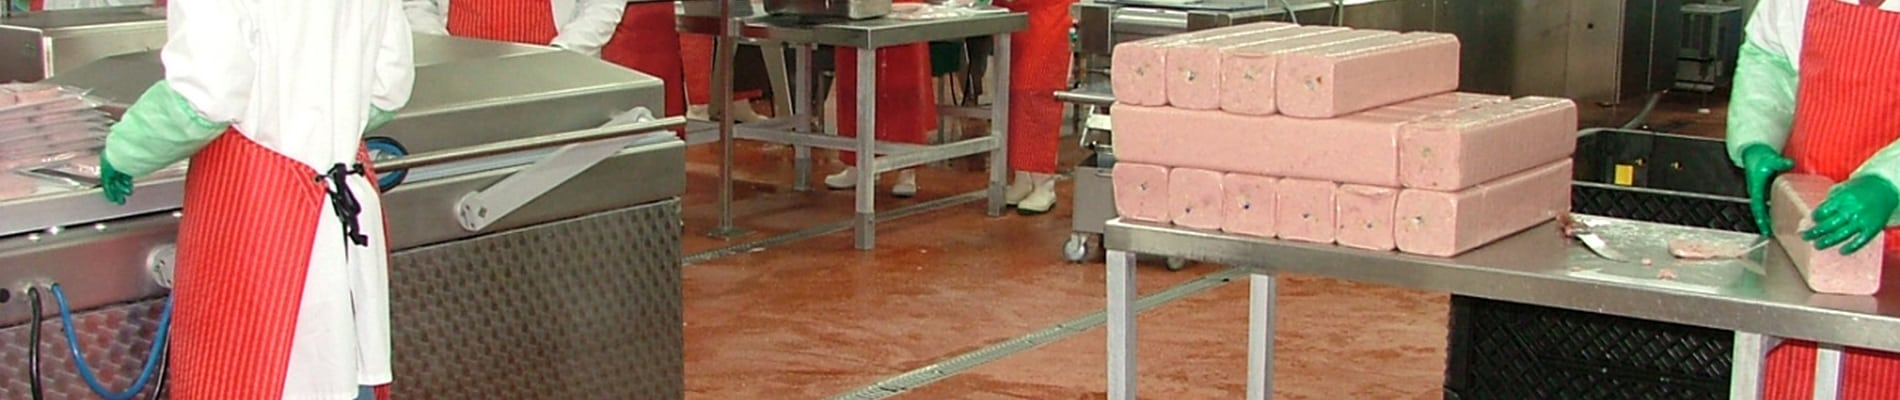 meat processing floor